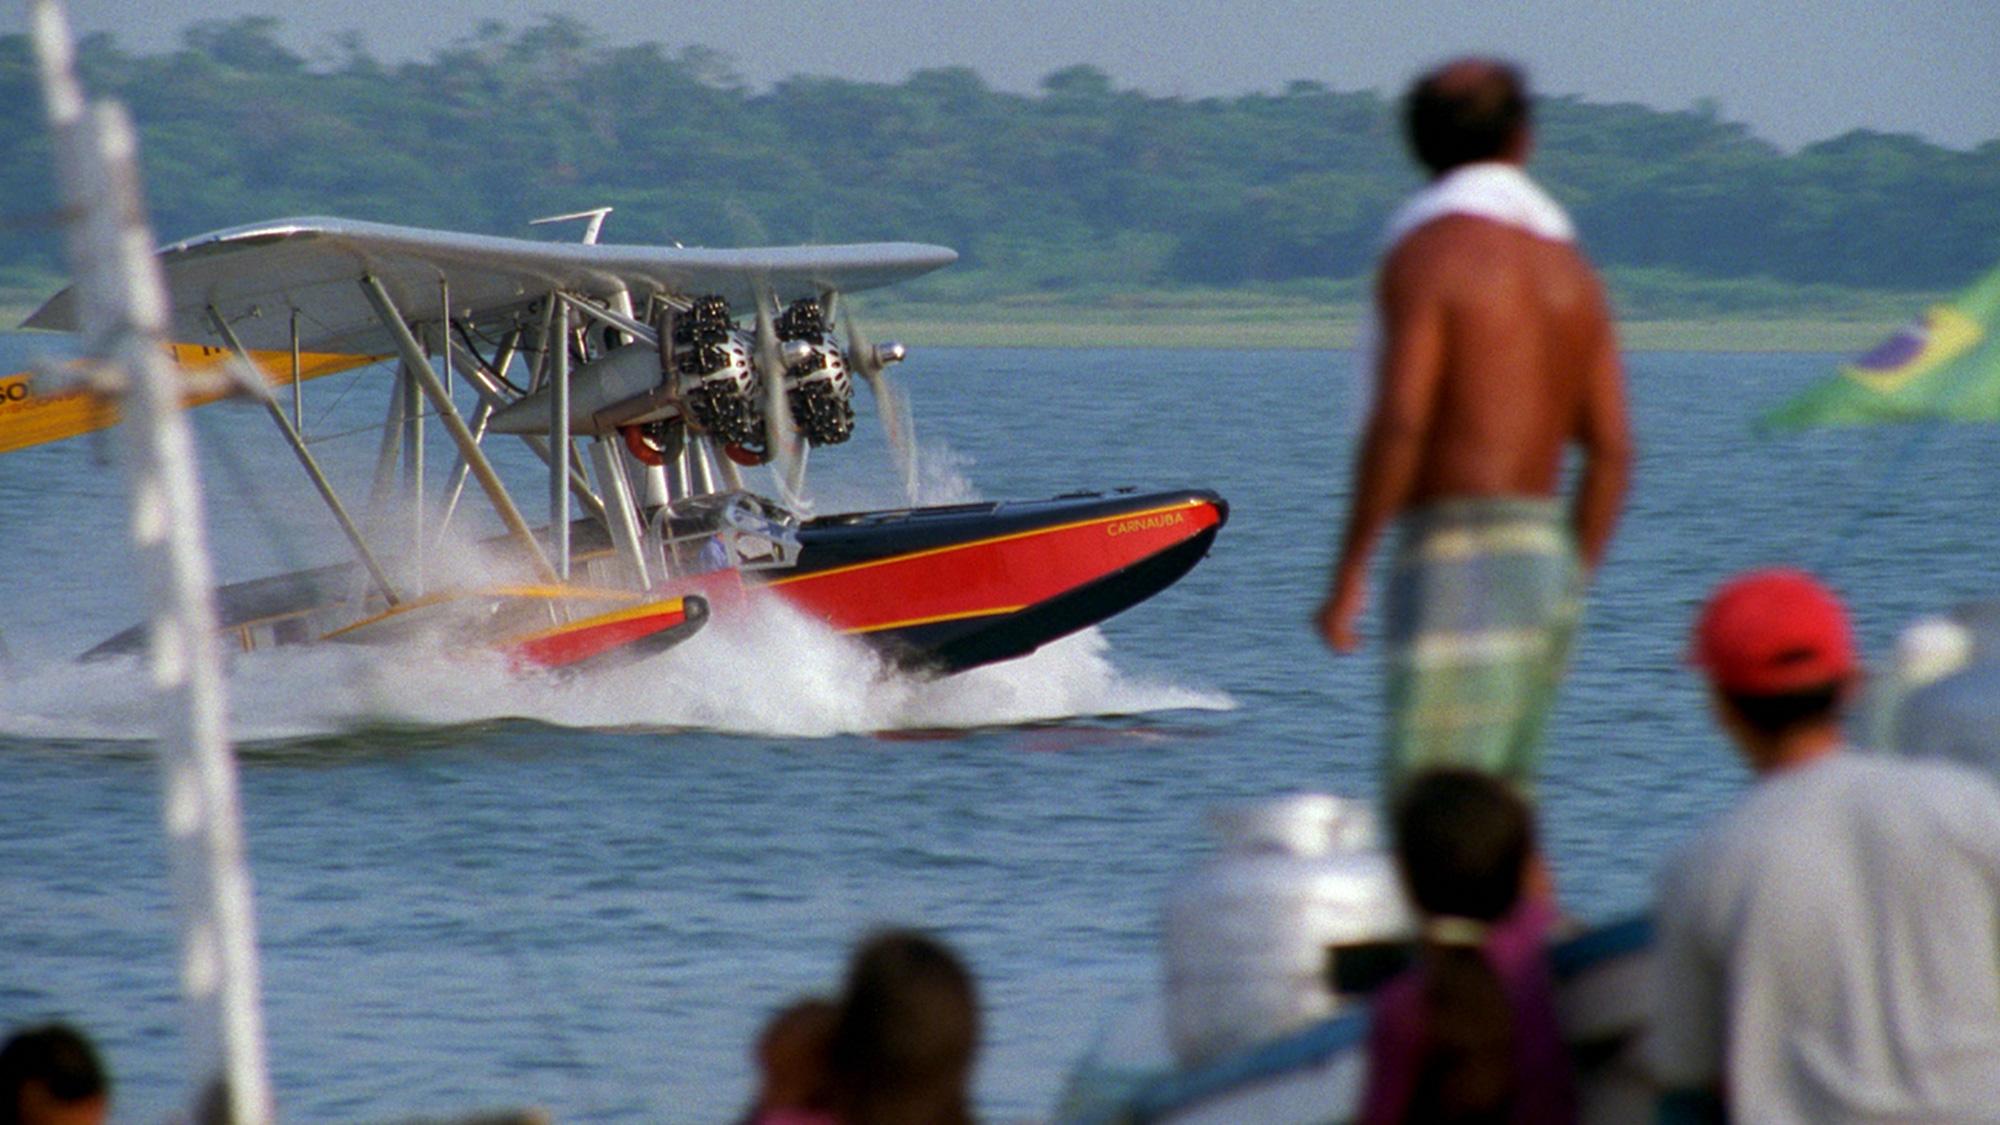 Sam Johnson landing the Sikorsky S-38 amphibious  plane on his trip to Brazil.